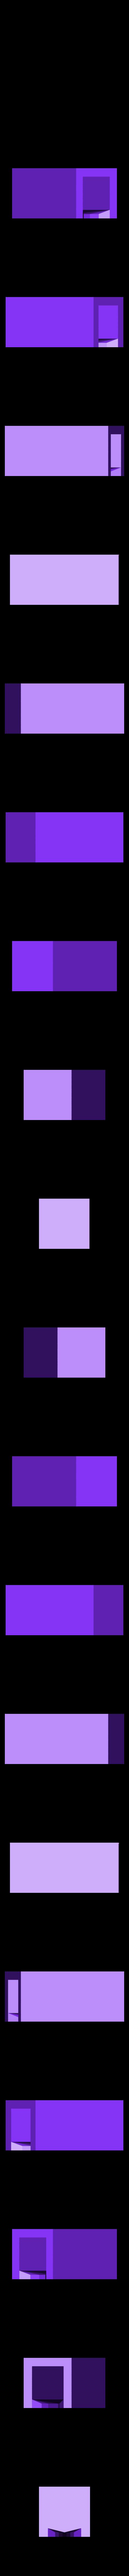 Towel-Hook-Minimal.stl Download free STL file Towel hook a bit different • 3D printer template, Urukgar4D